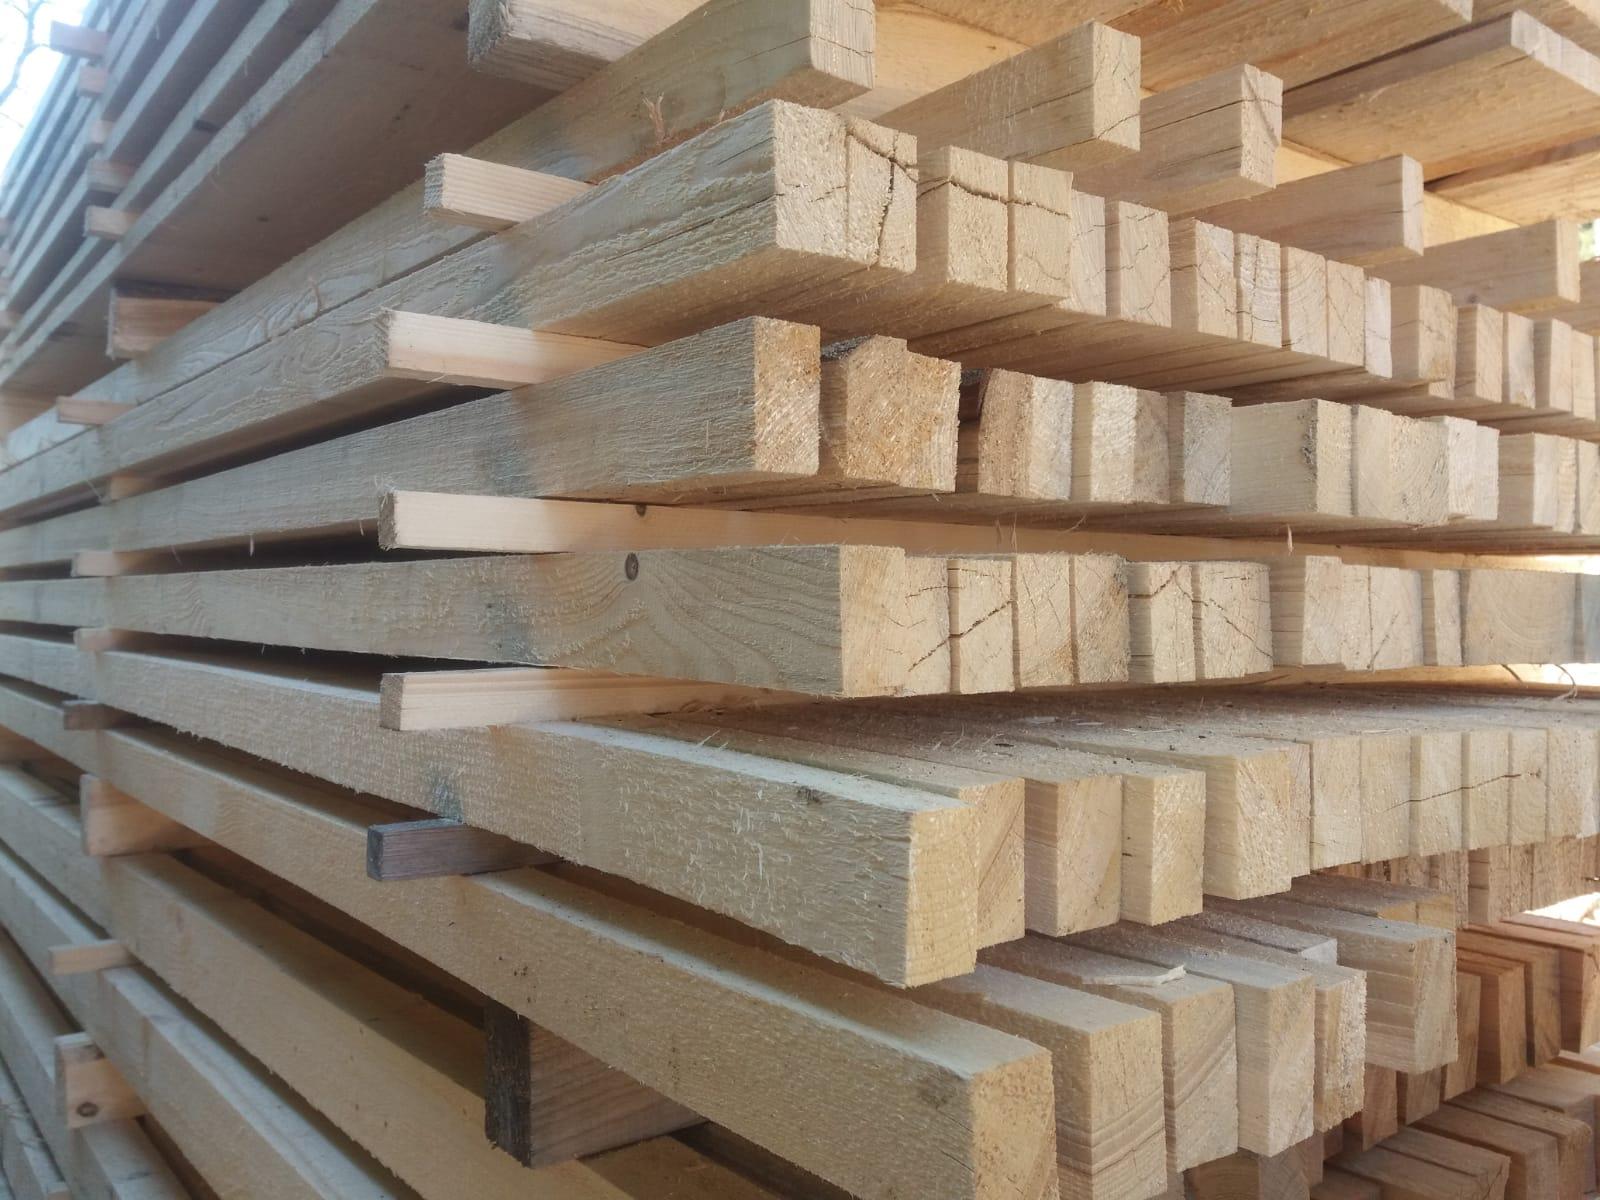 fichten-dachlatten-3x5x400cm